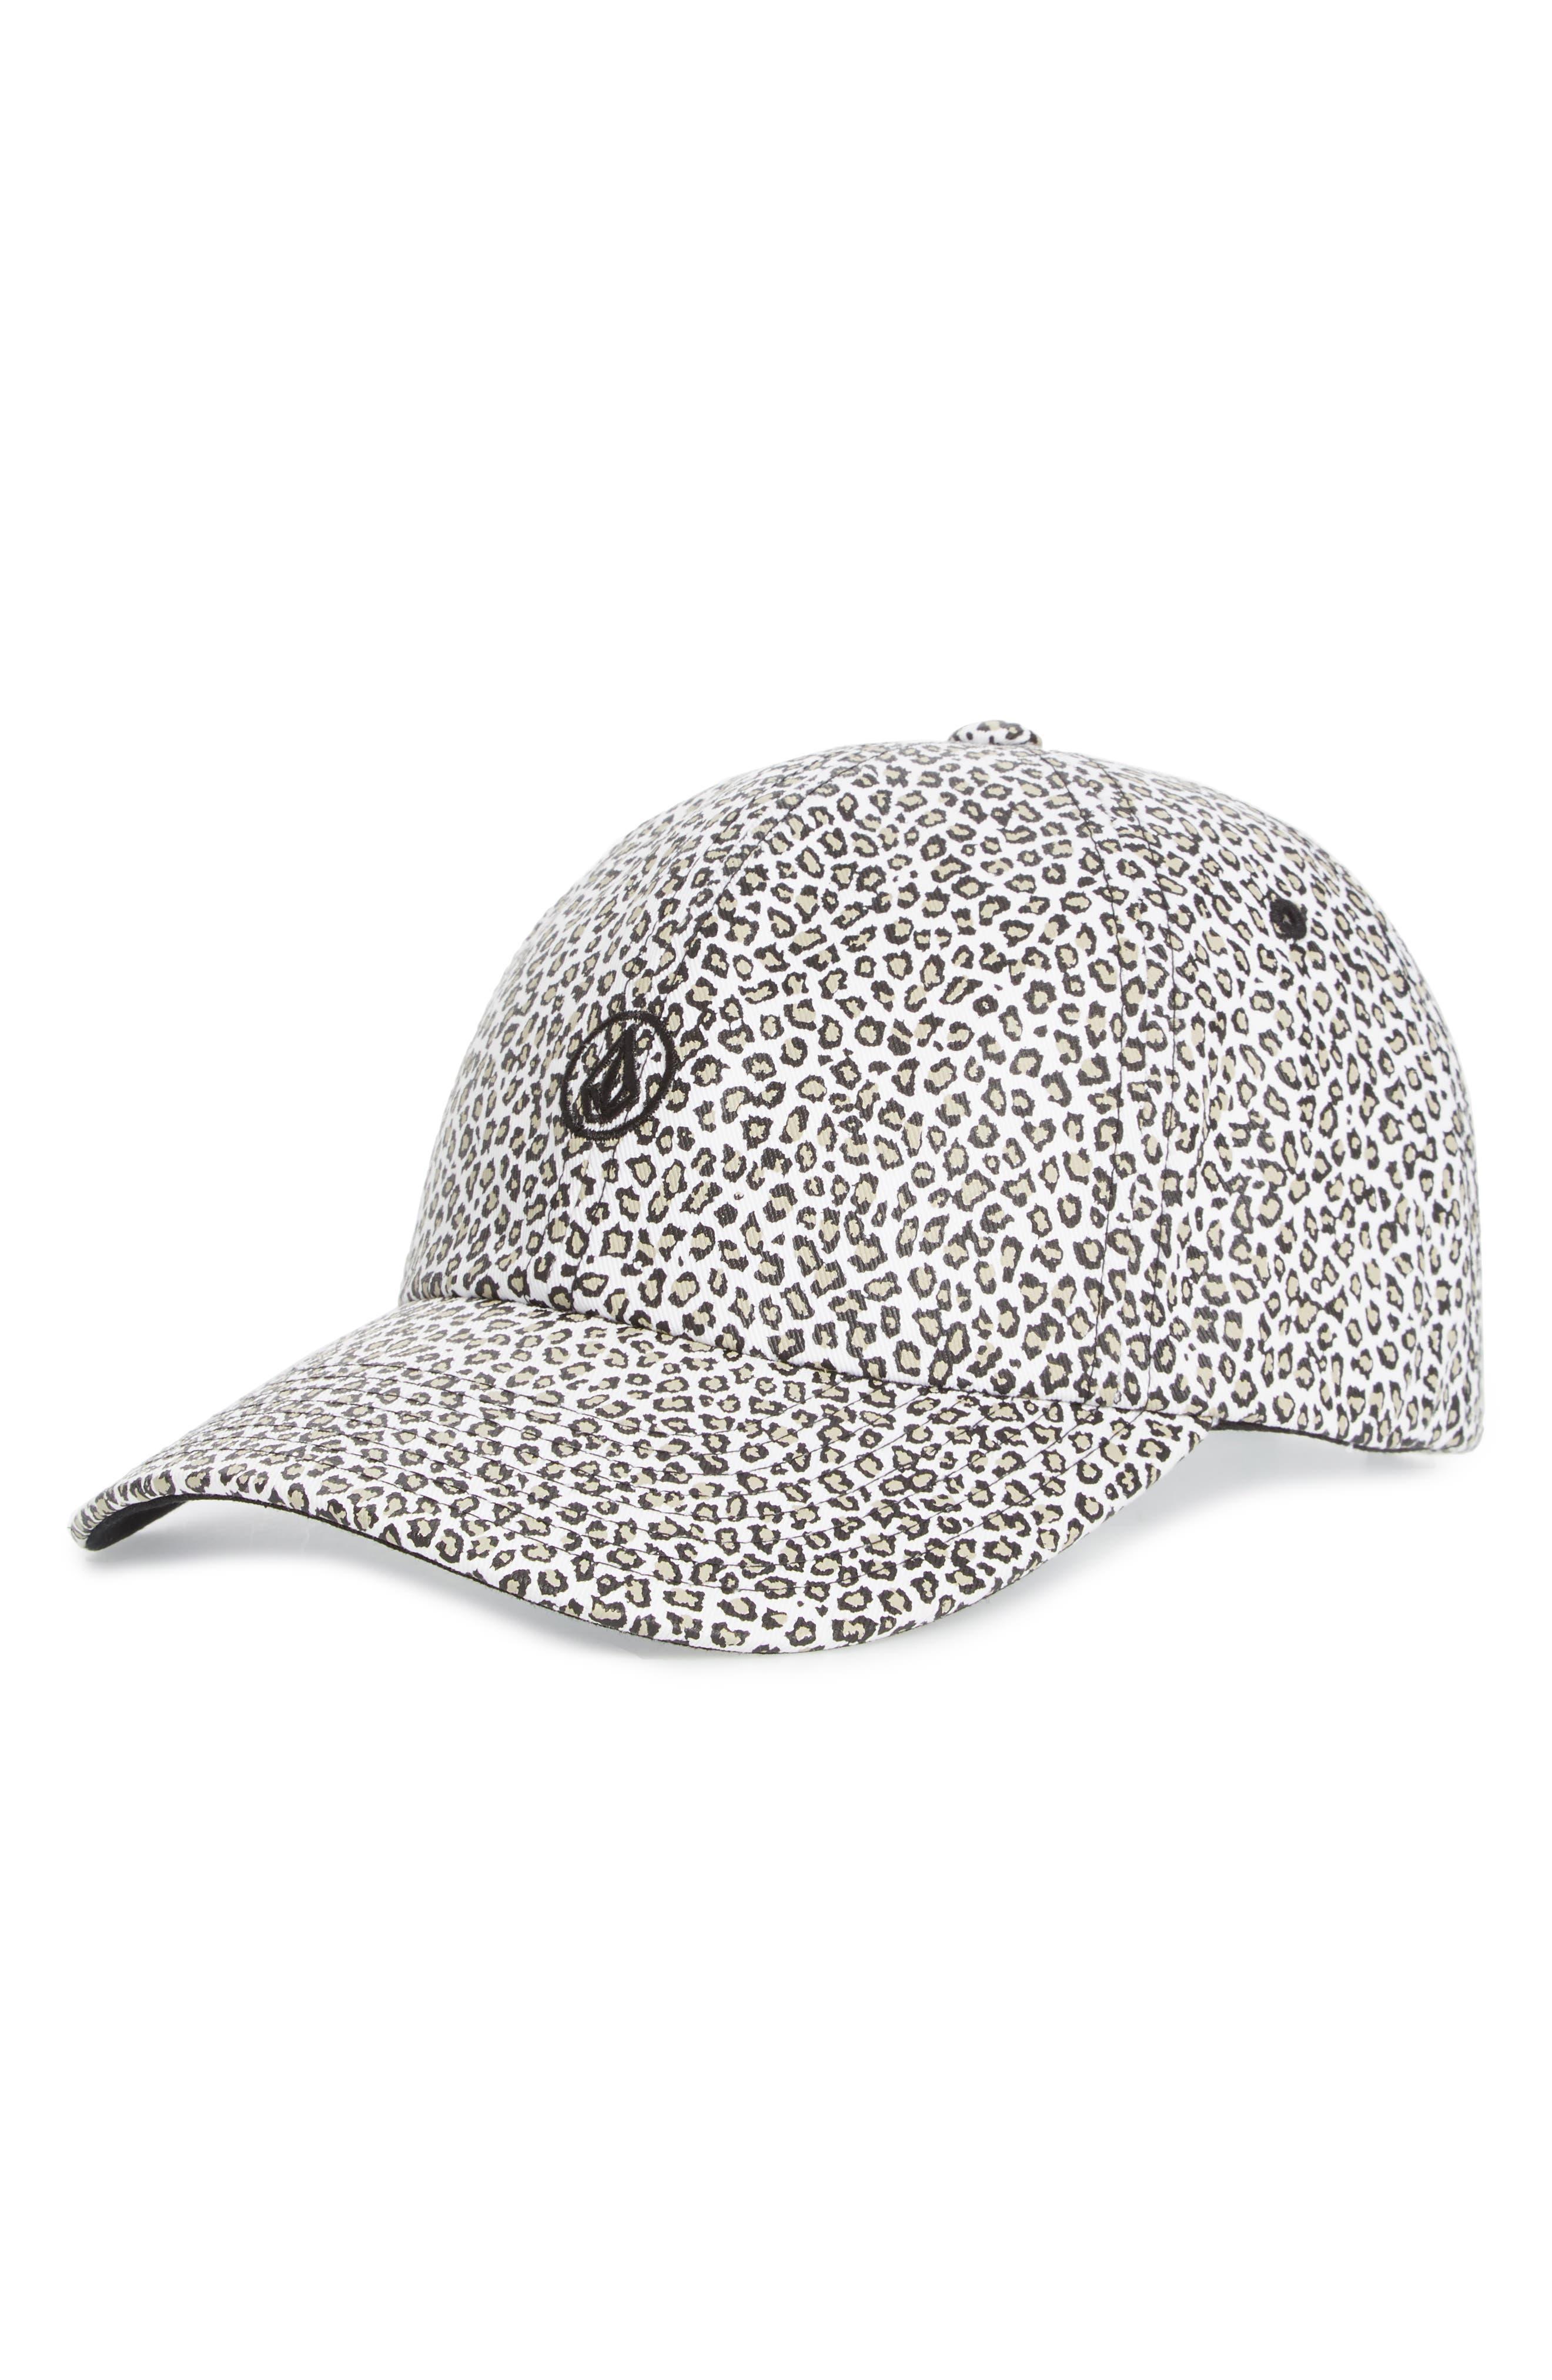 Volcom Cherry Bombs Dad Hat